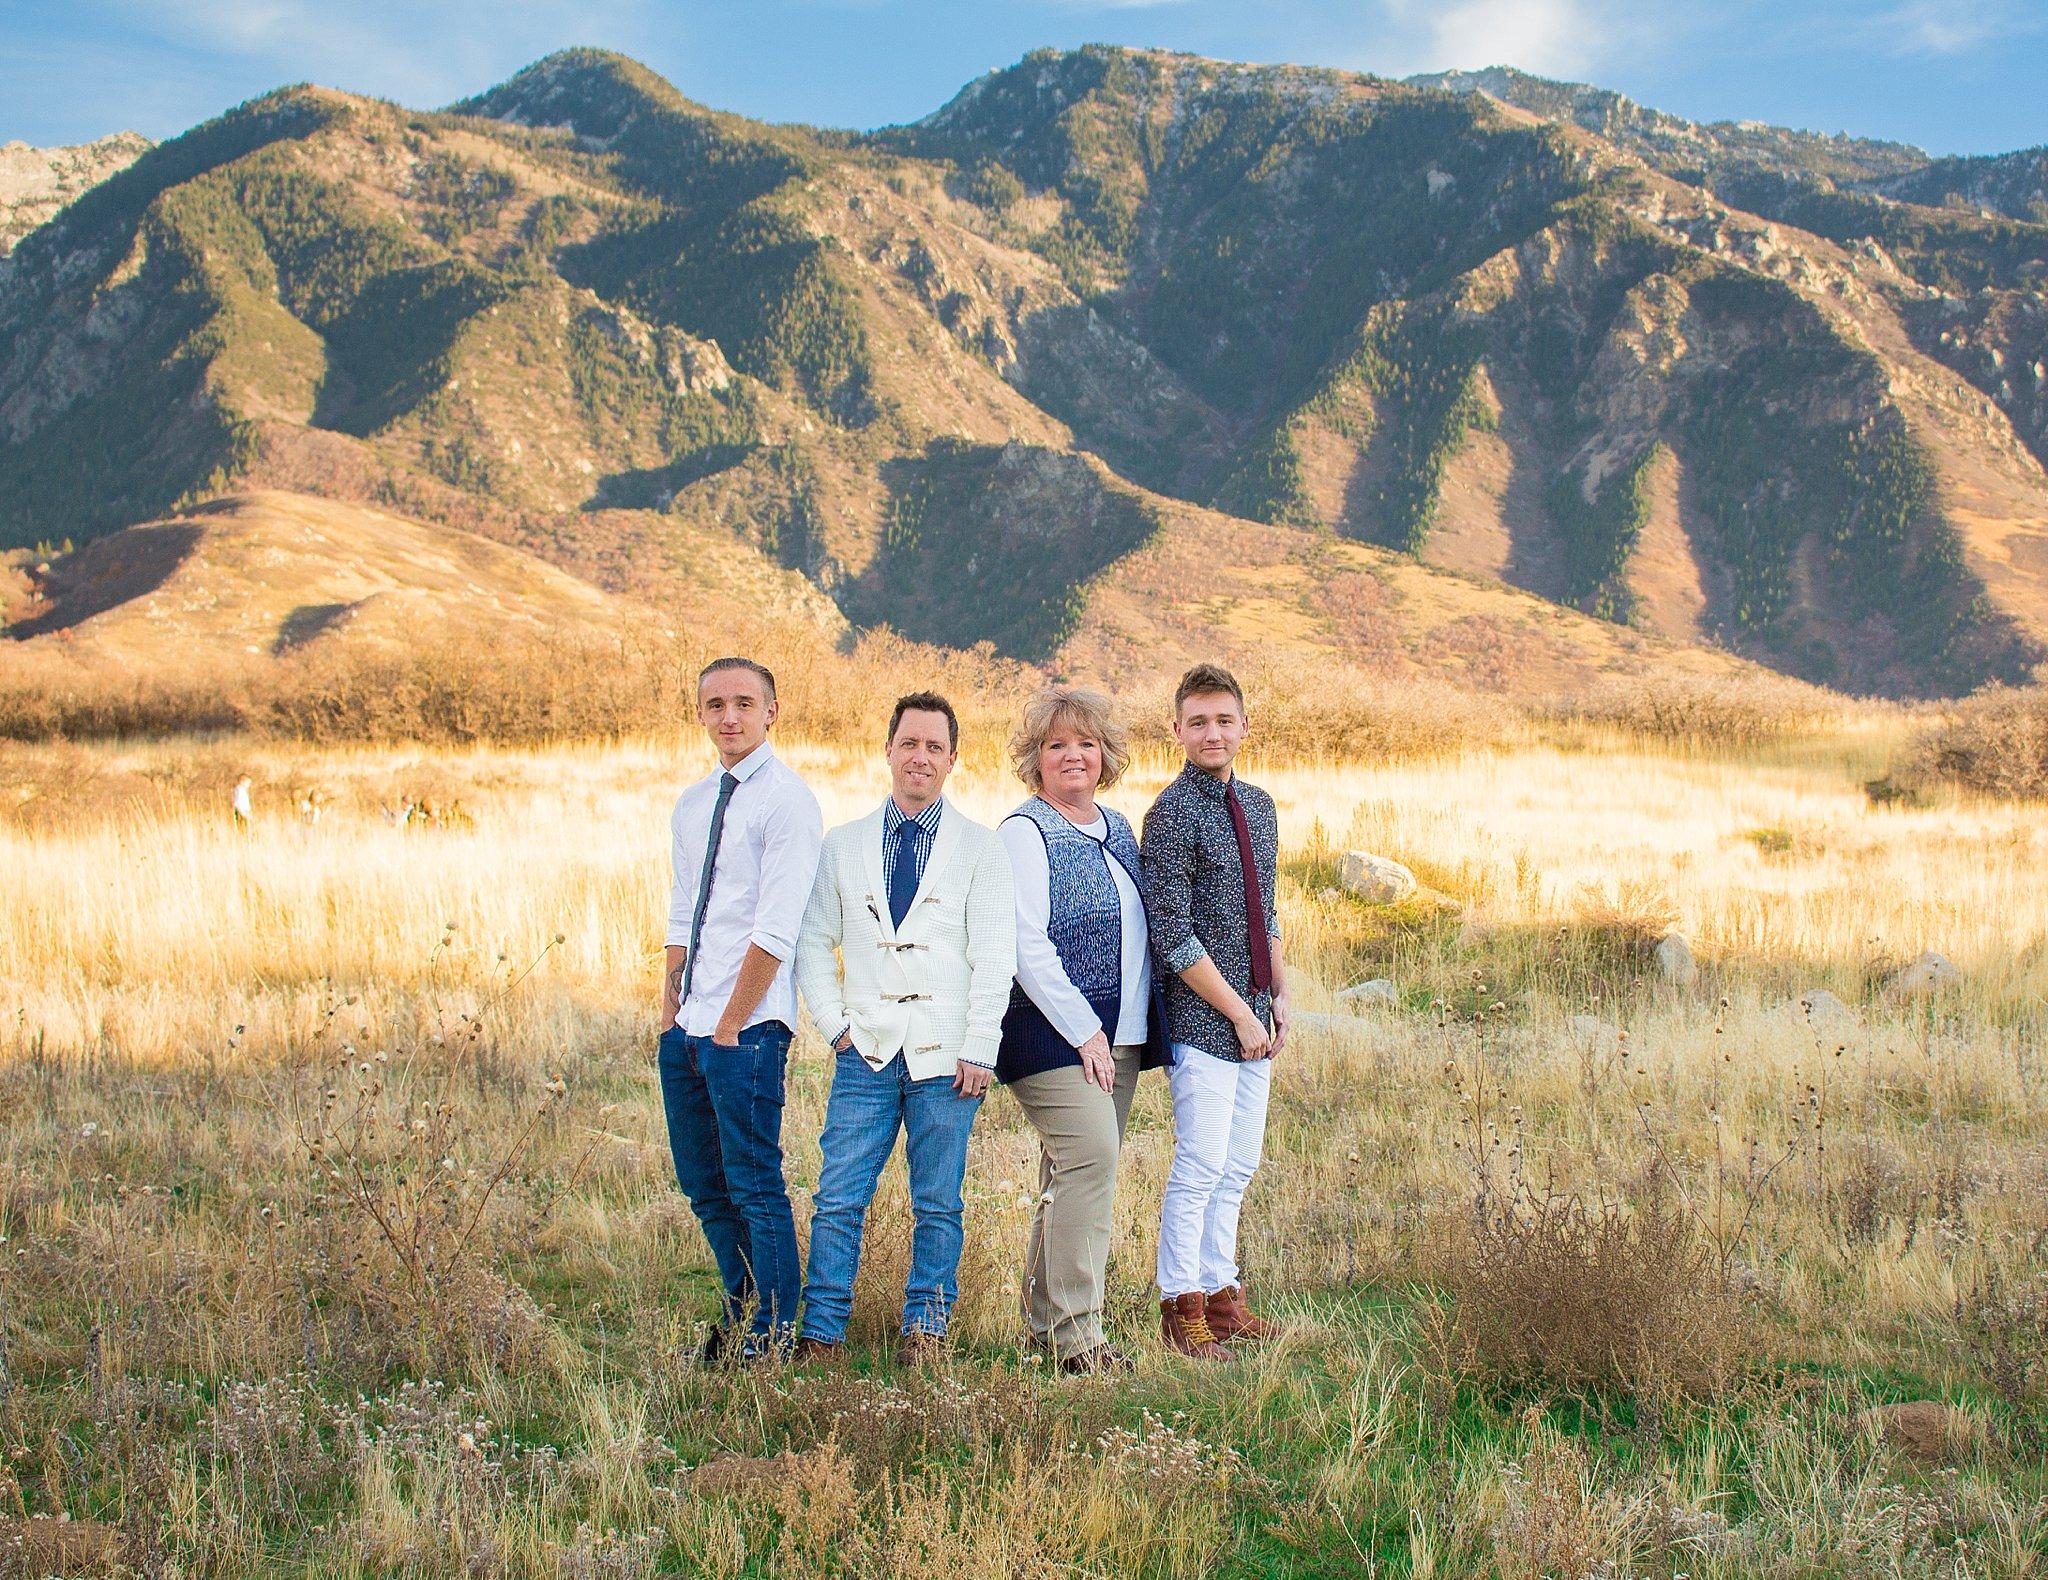 salt lake city family photographer